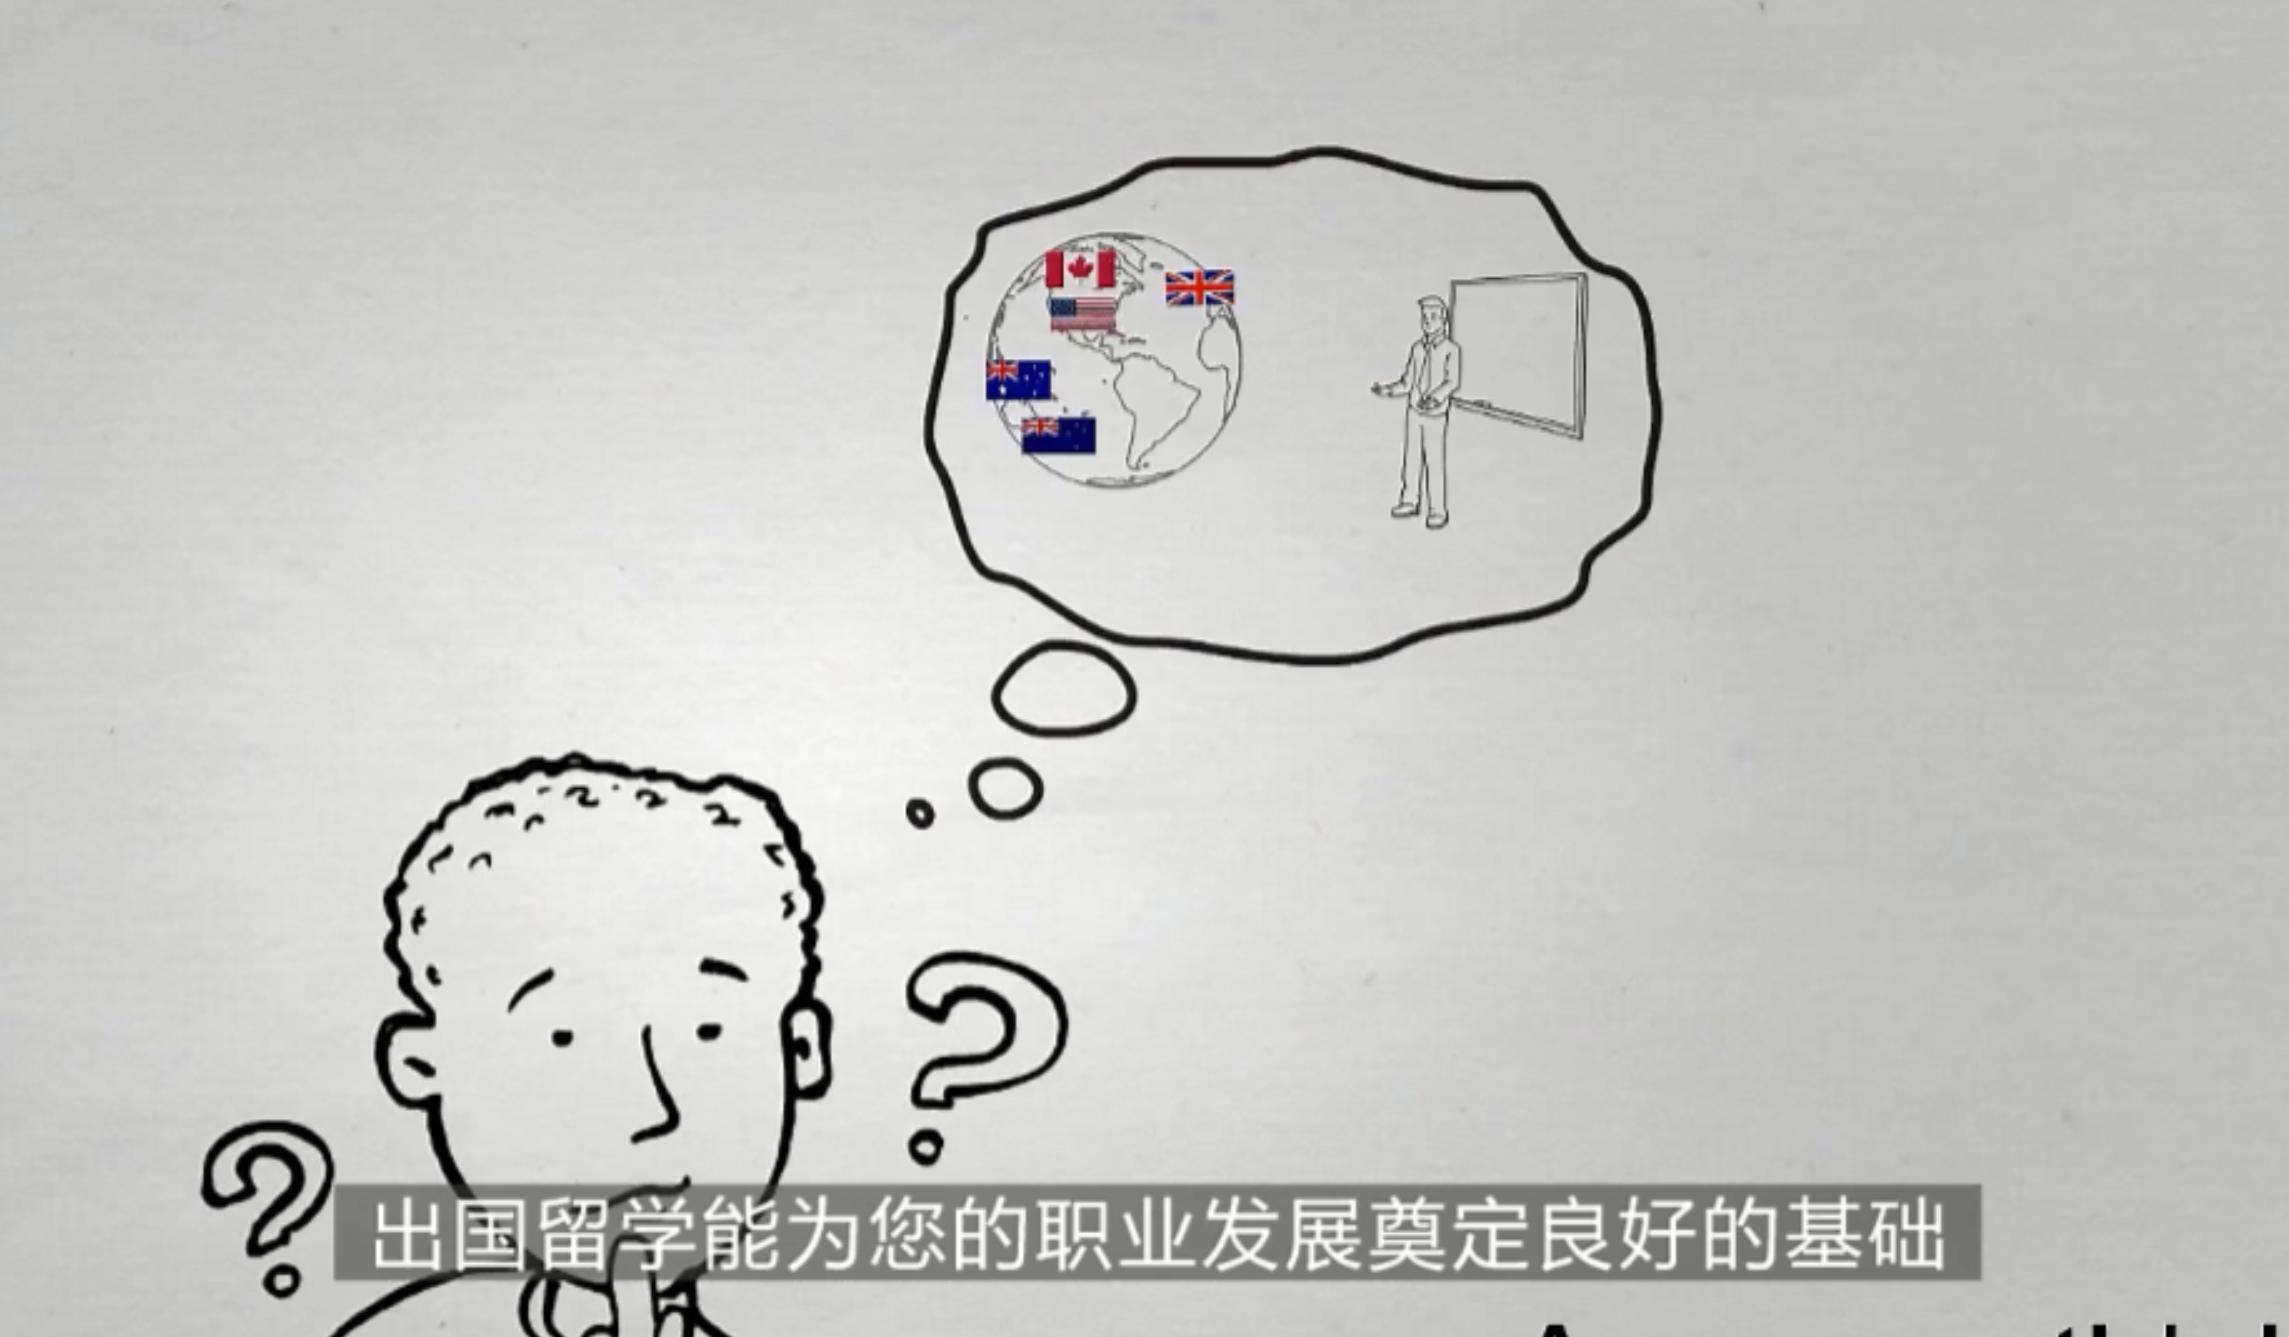 idp education explainer video